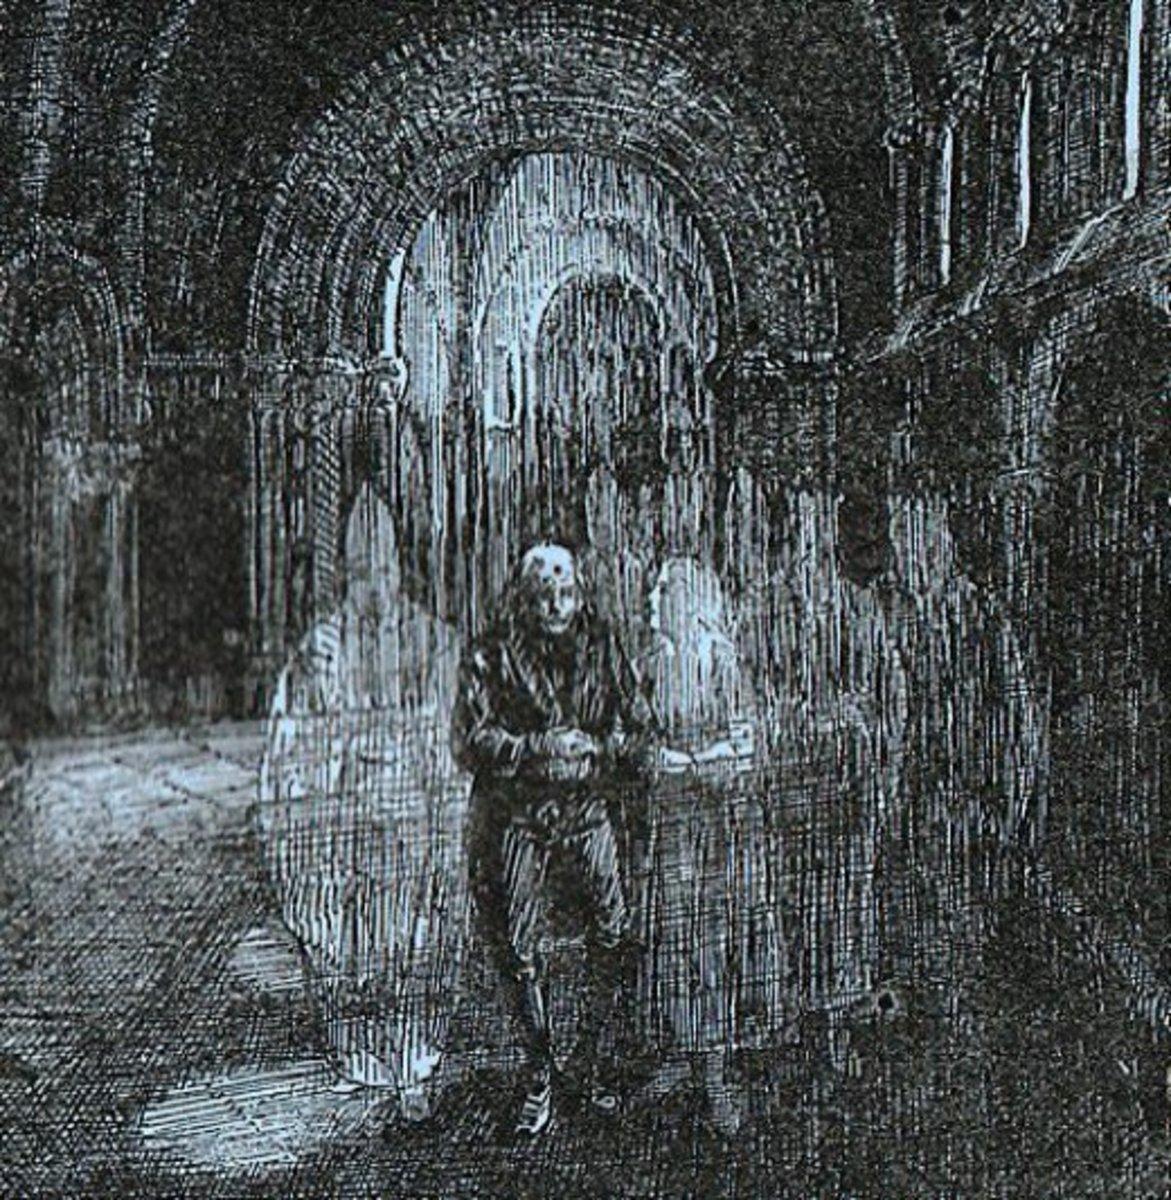 Irish Ghosts (1888)